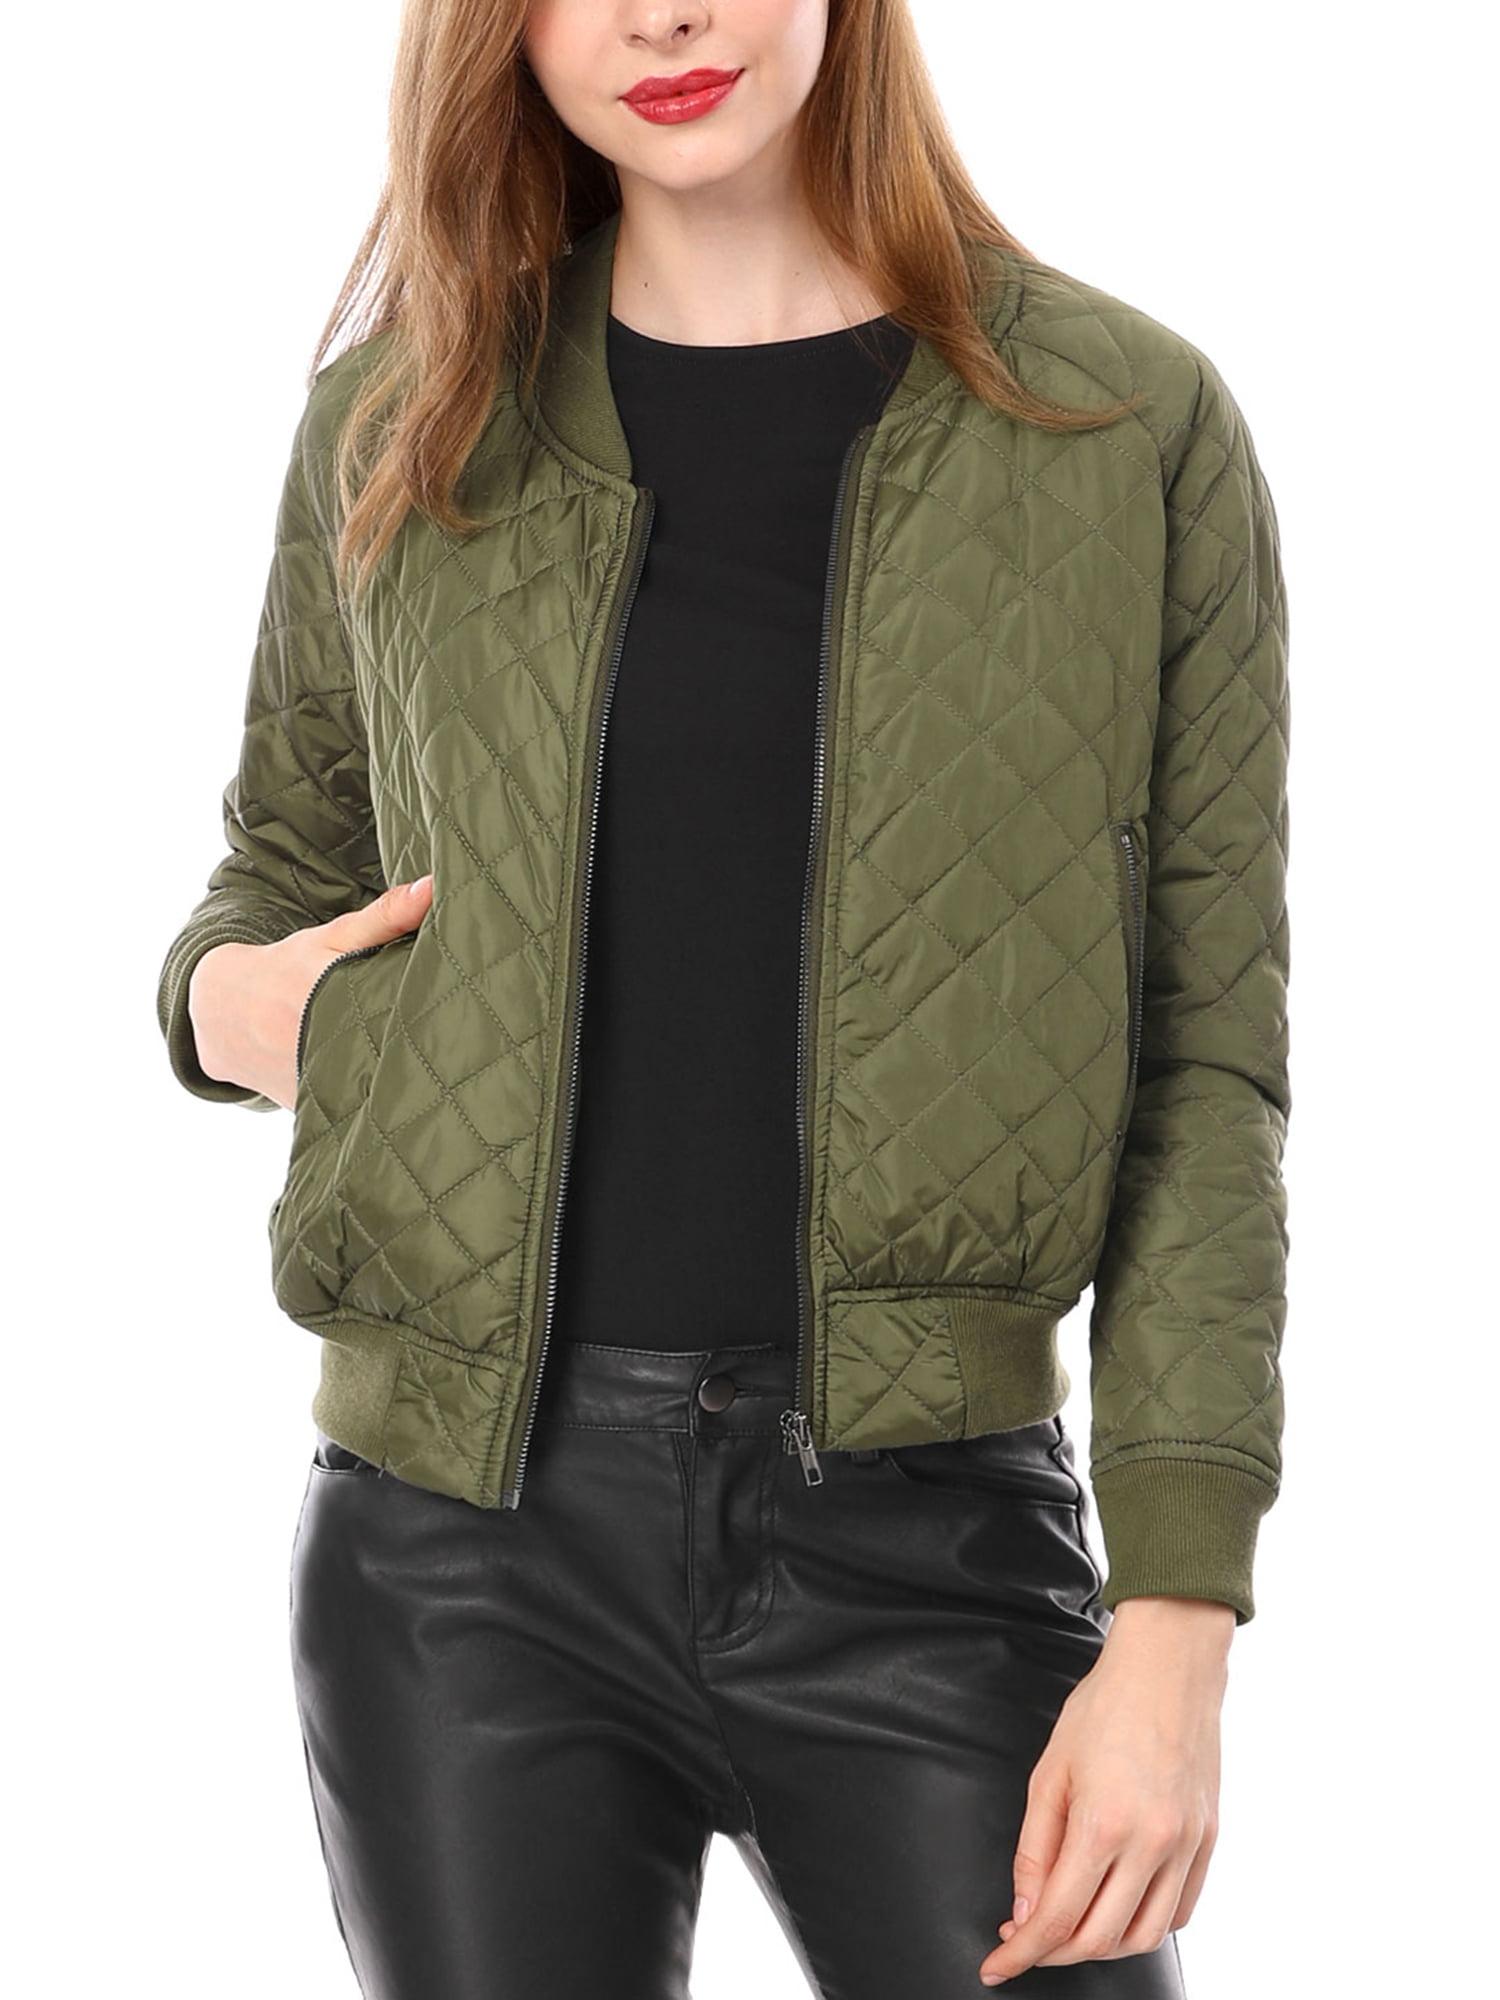 Women Quilted Zip Up Raglan Sleeves Bomber Jacket Coat Outerwear Pink XS (US 2)